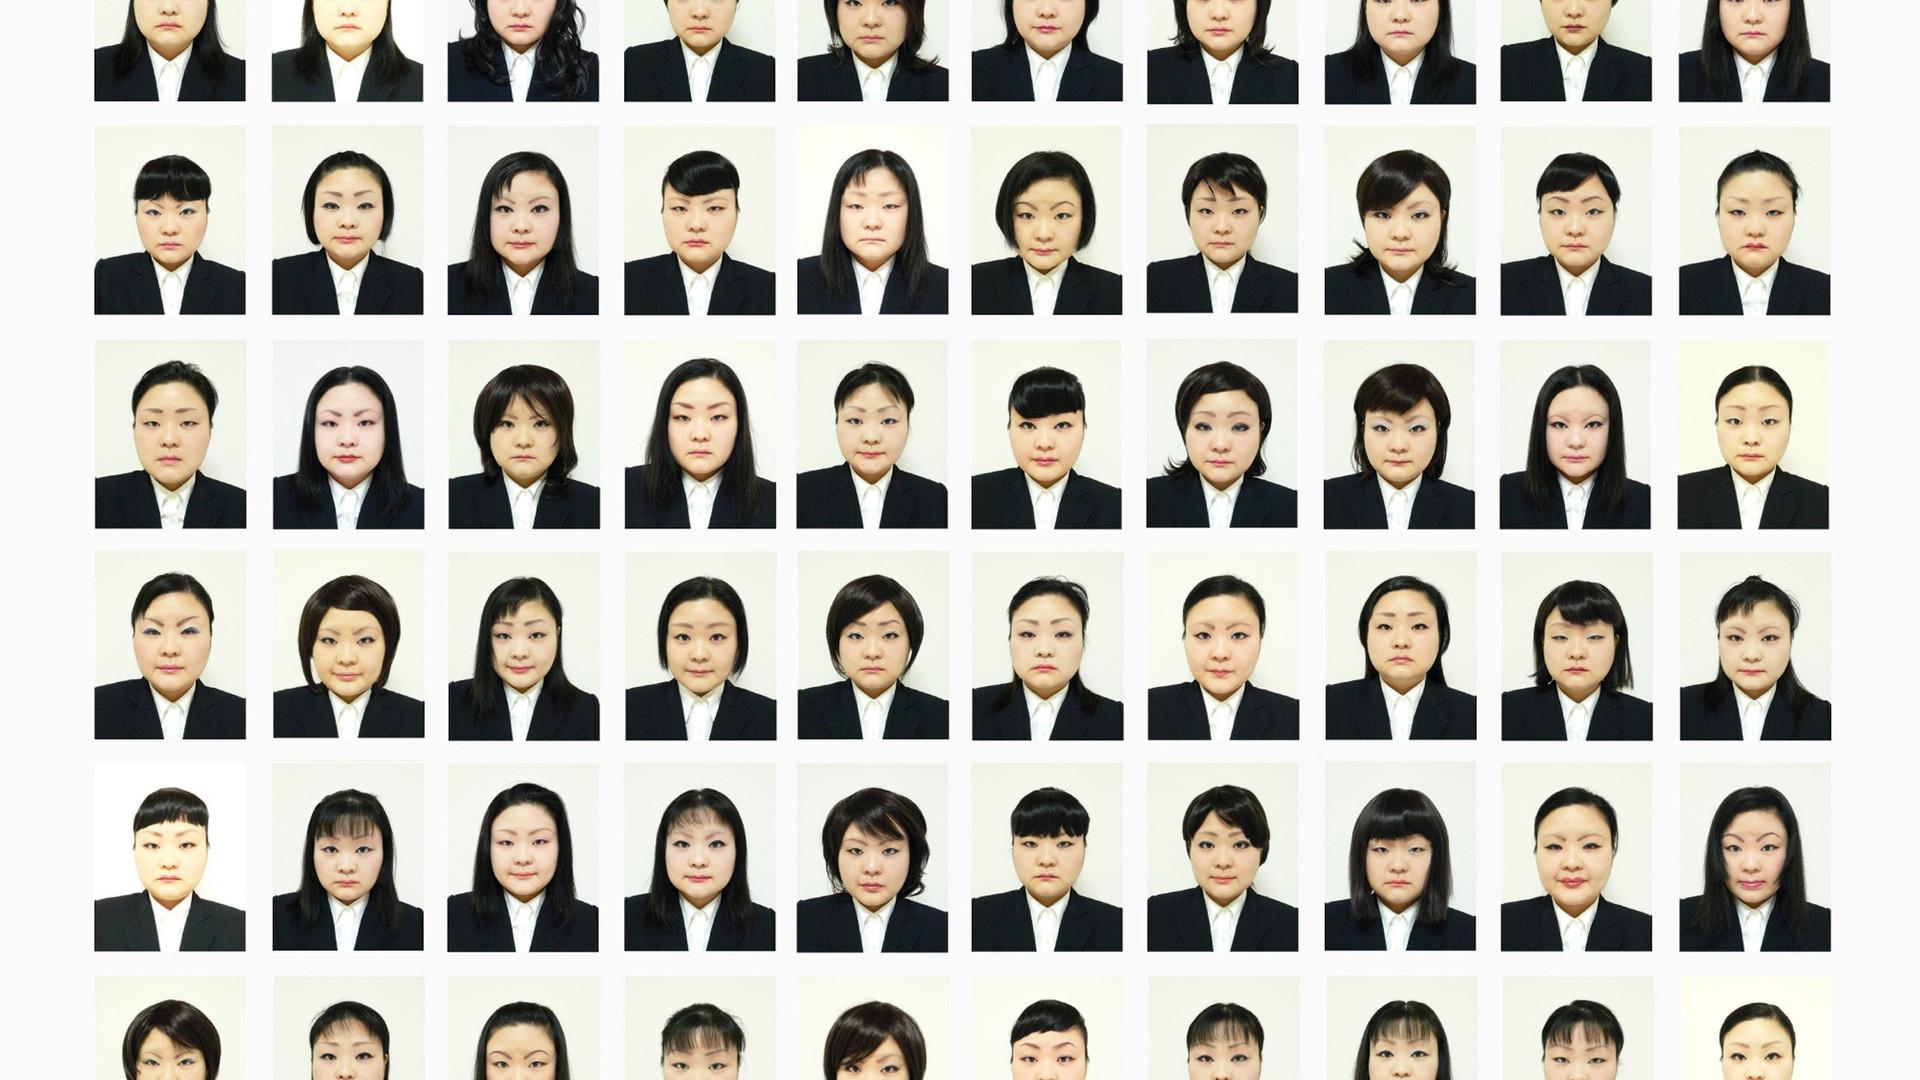 Tomoko Sawada, Recruit/Navy, 2006